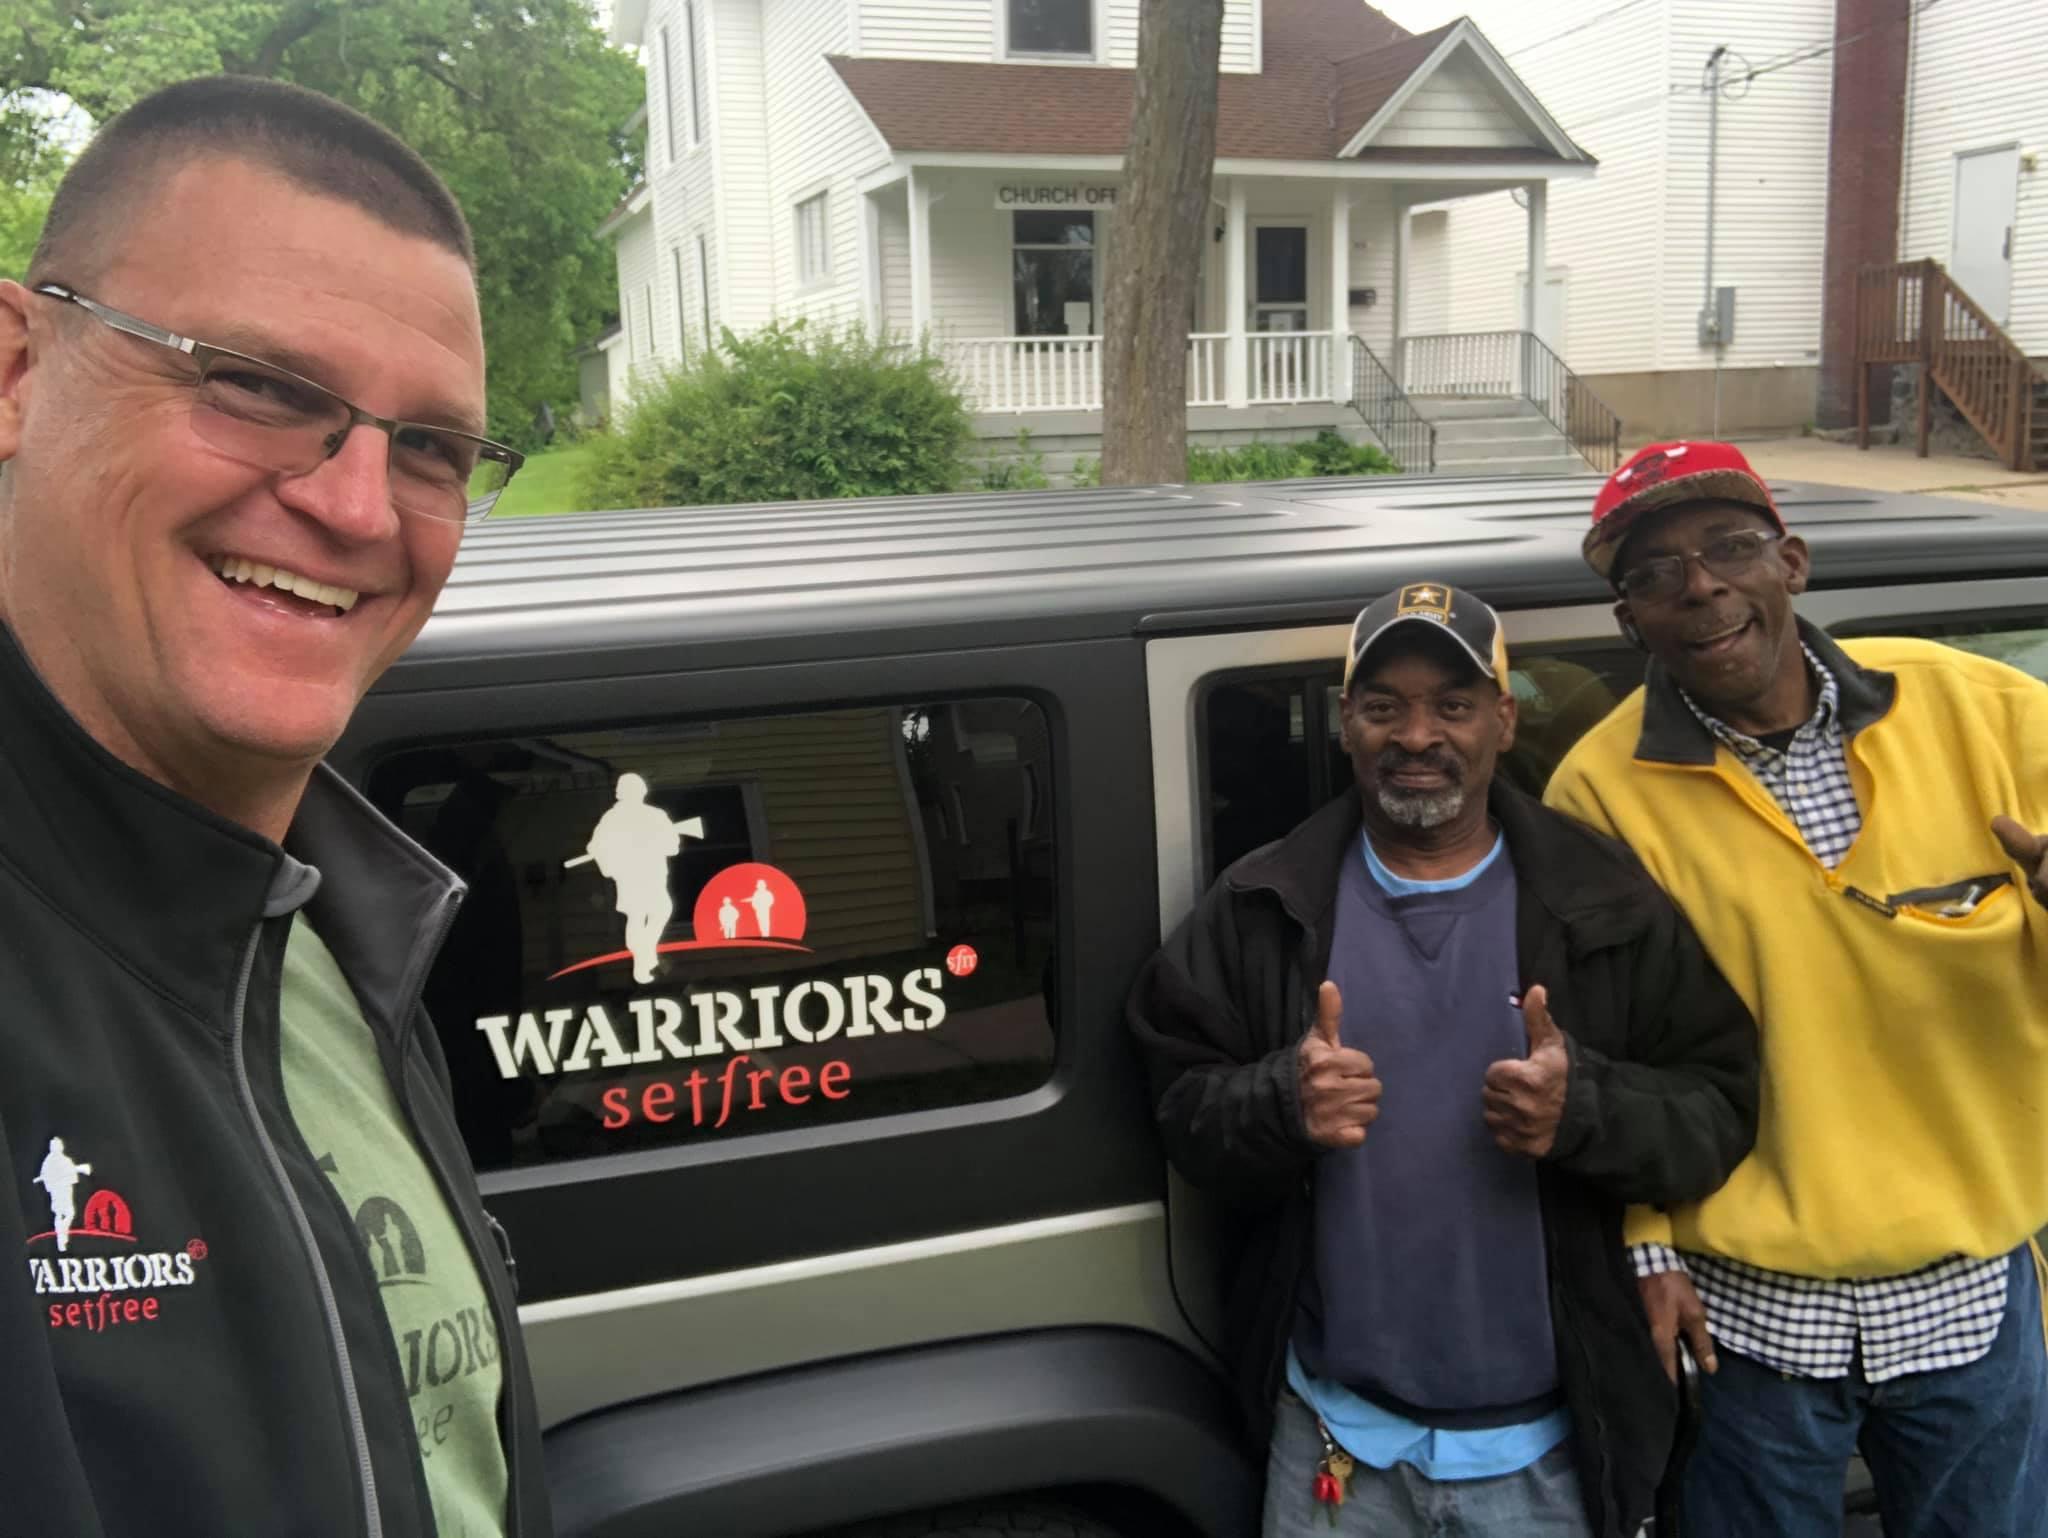 Ministry helping veterans, first responders find PTSD healing